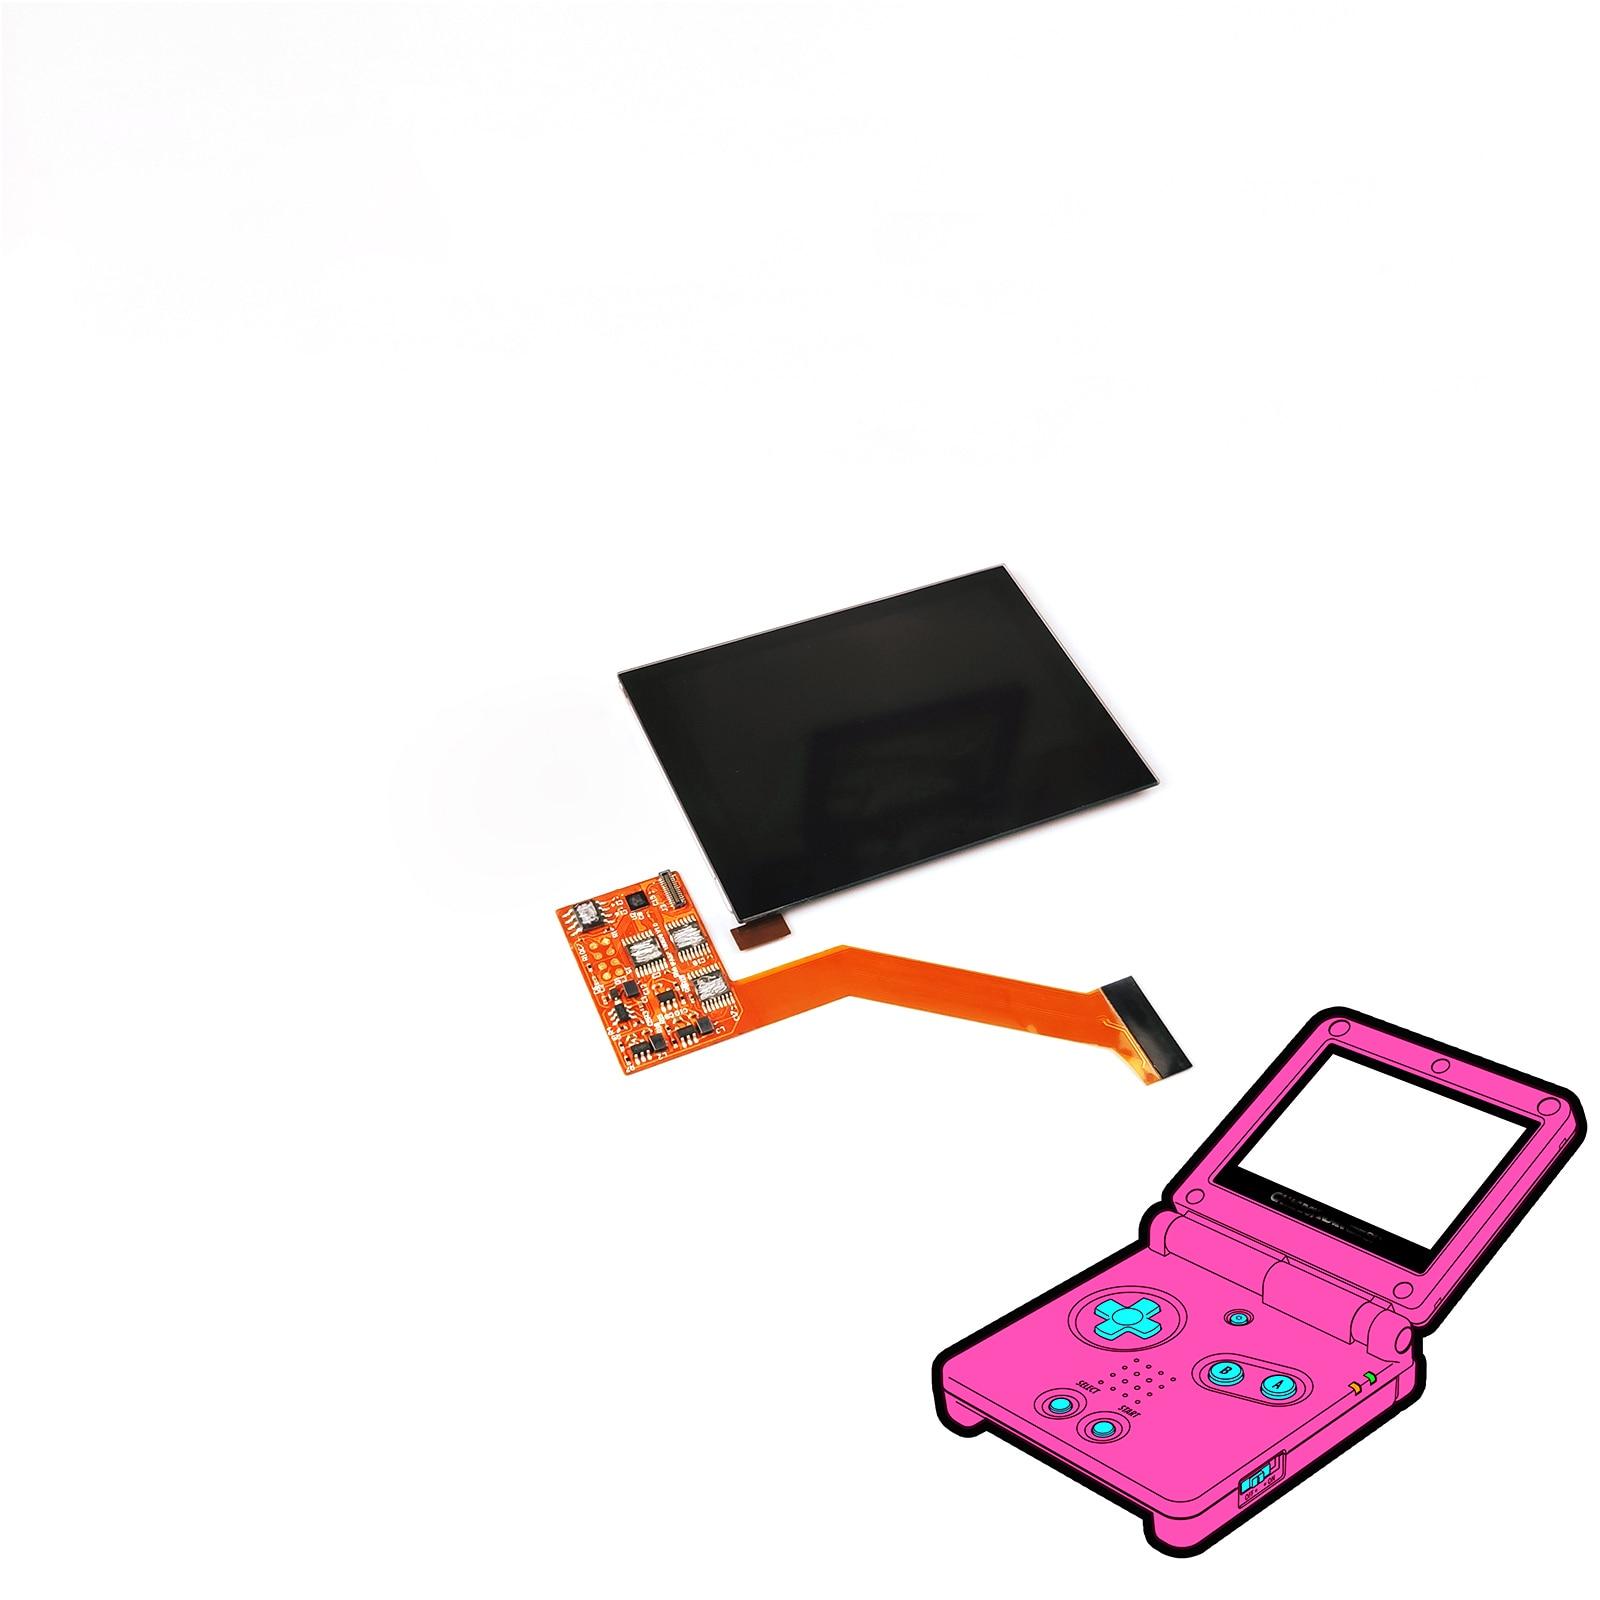 Pantalla LCD IPS para Nintendo GBA SP Pantalla de retroiluminación LCD de alto brillo LCD para Kits de piezas de repuesto GBASP